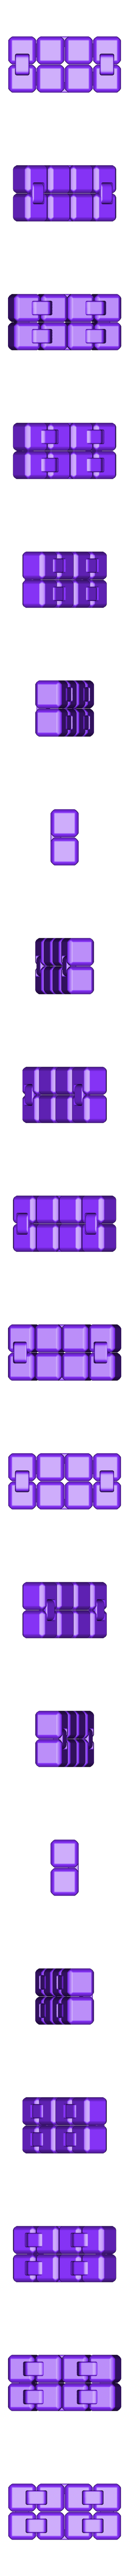 Fidget_Cube_blockGap0.125_hingeGap0.125.stl Download free STL file Fidget Cube Remix • Object to 3D print, WalterHsiao